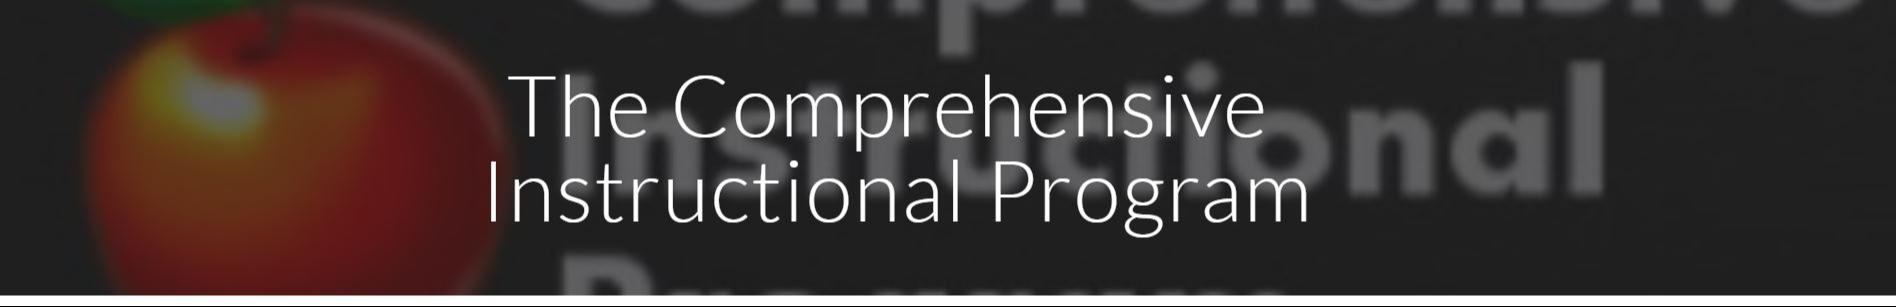 Comprehensive Instructional Program